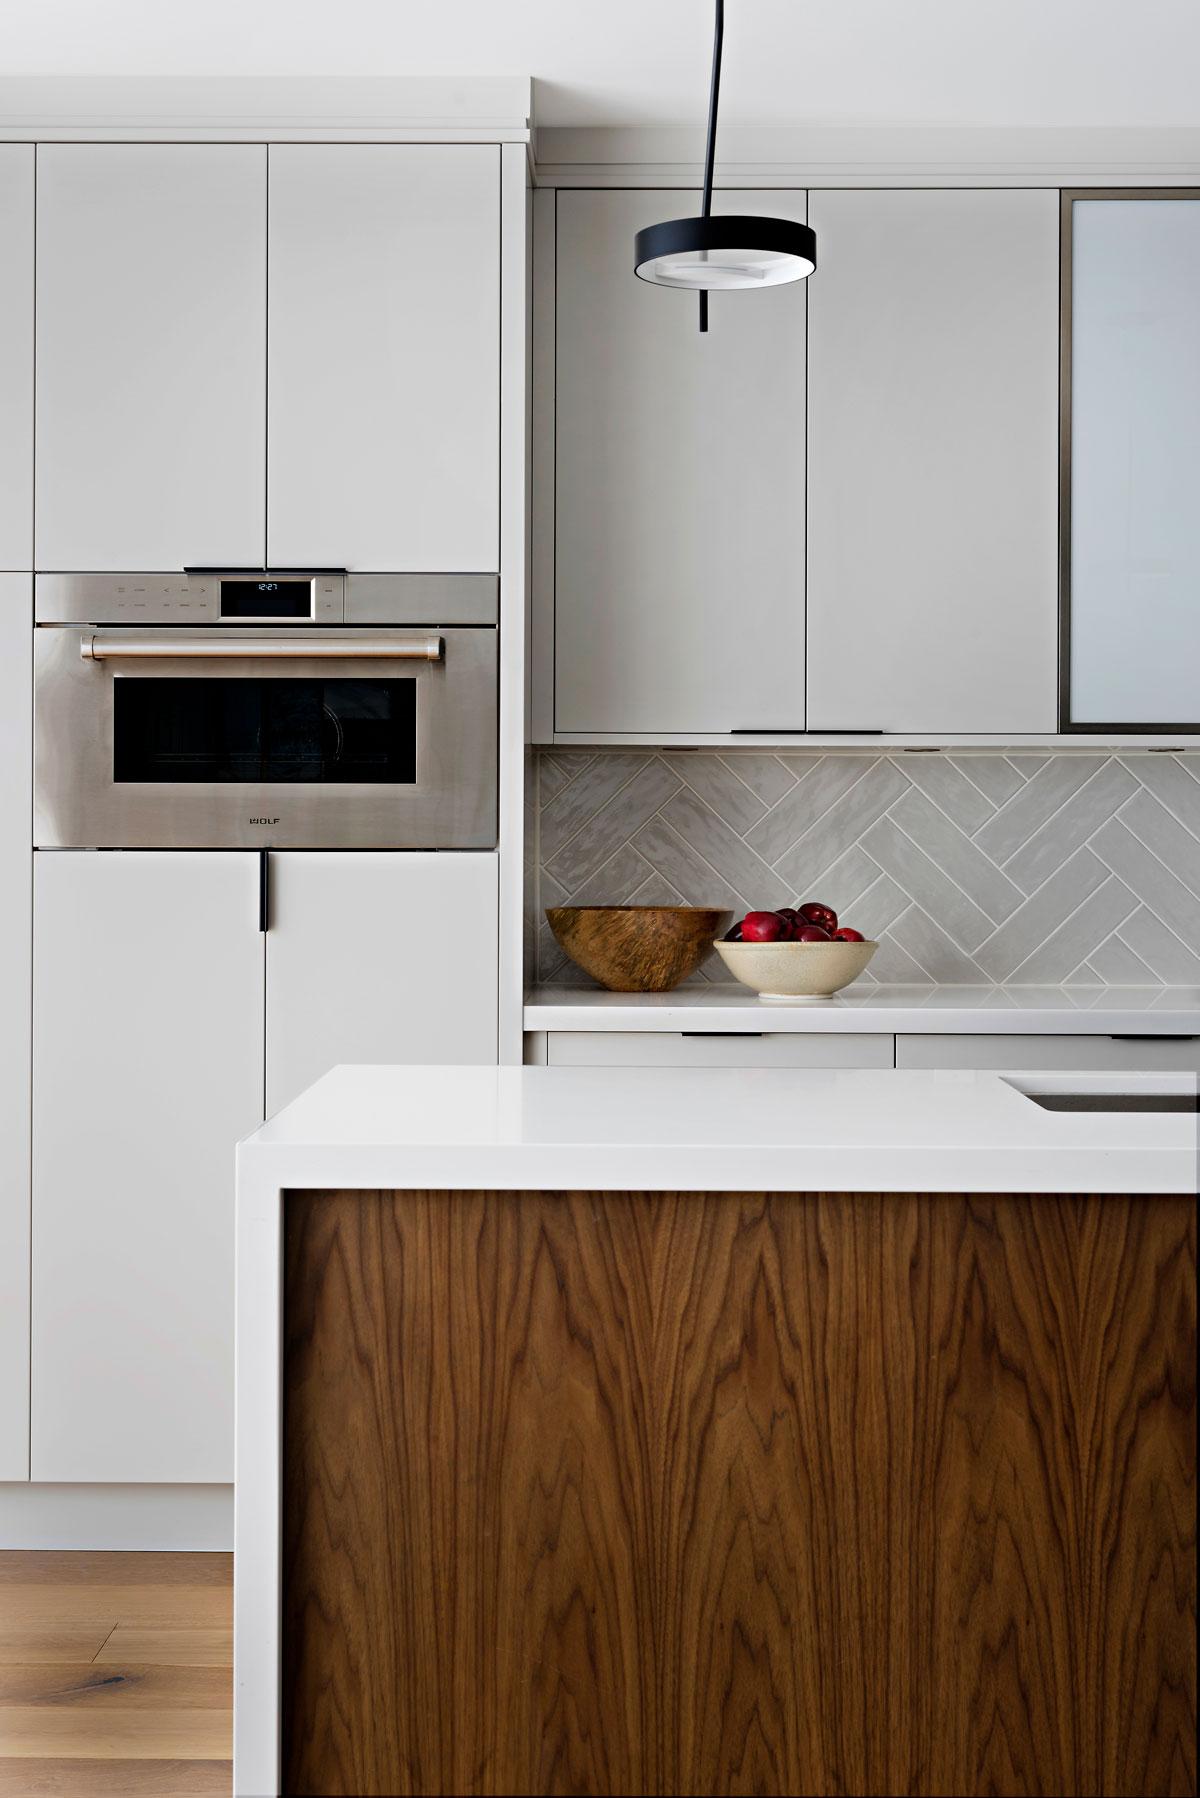 kitchen-wall-oven-backsplash.jpg